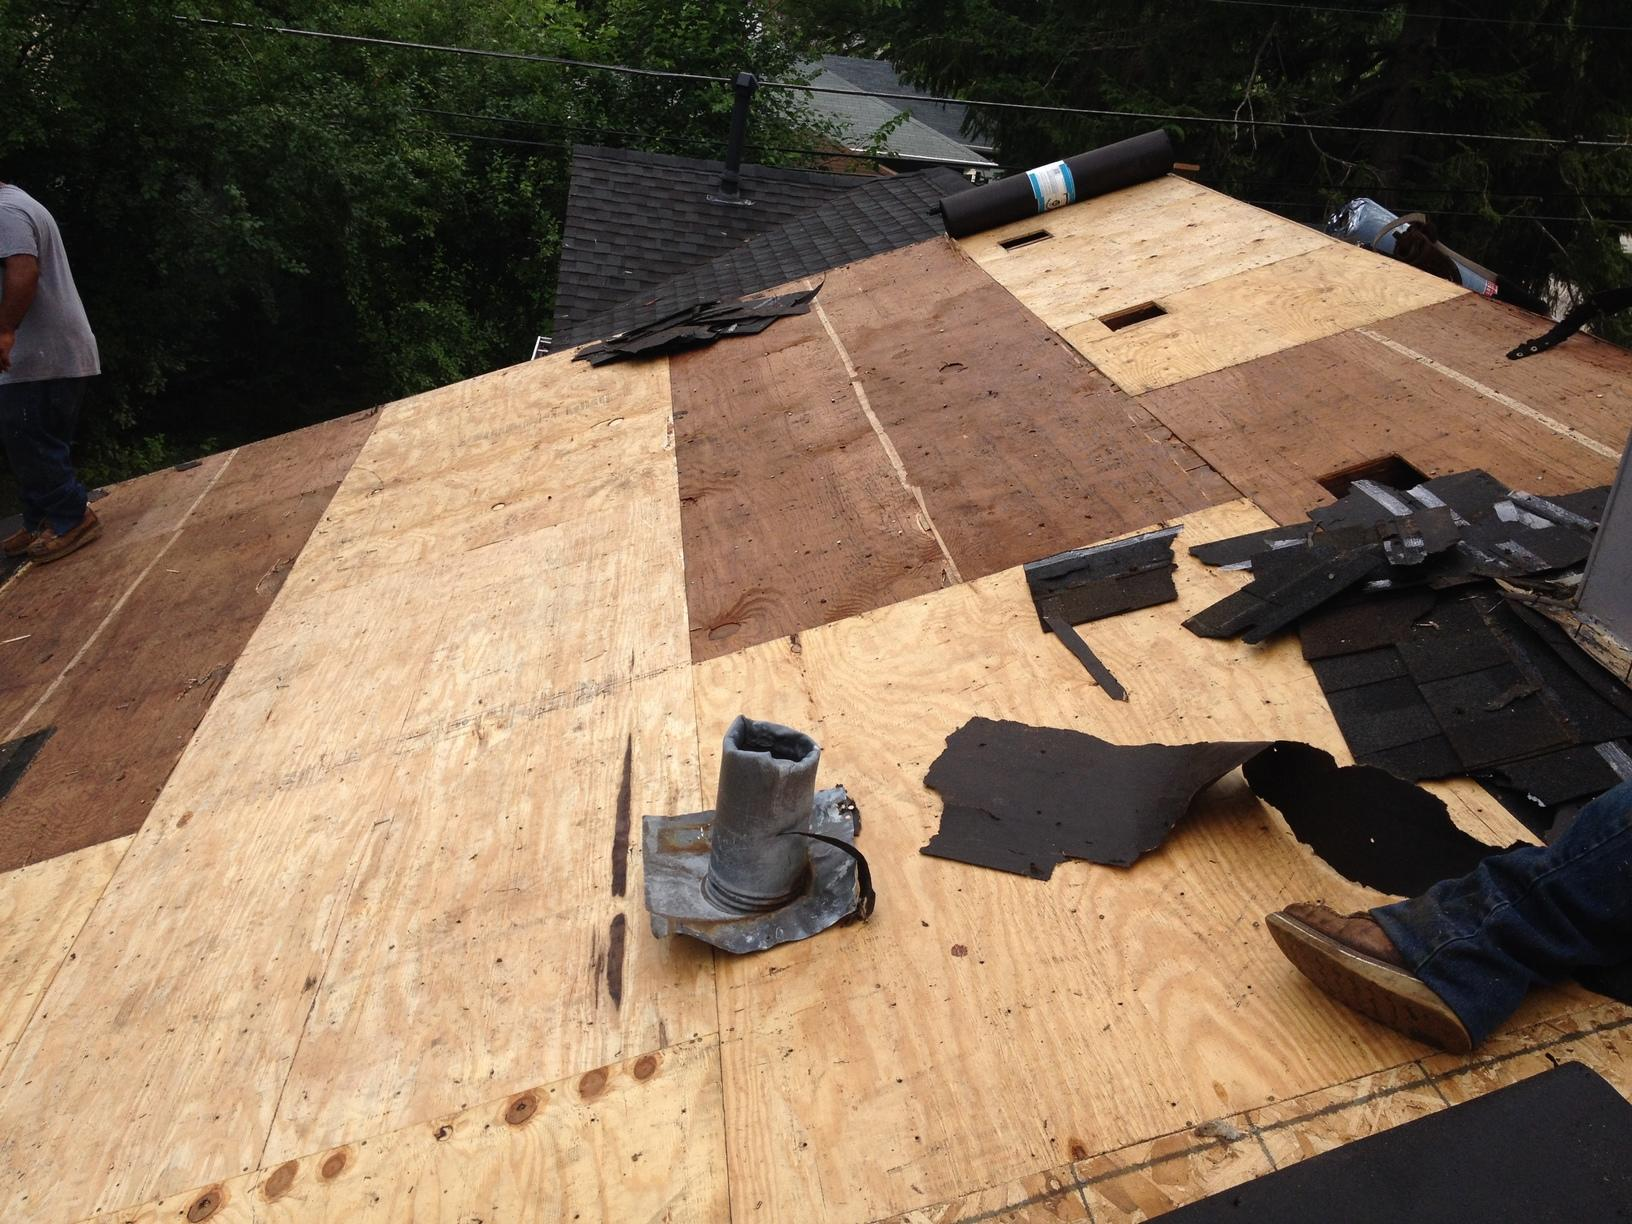 Fallen Tree & Wind Damage in Rolling Meadows IL - After Photo